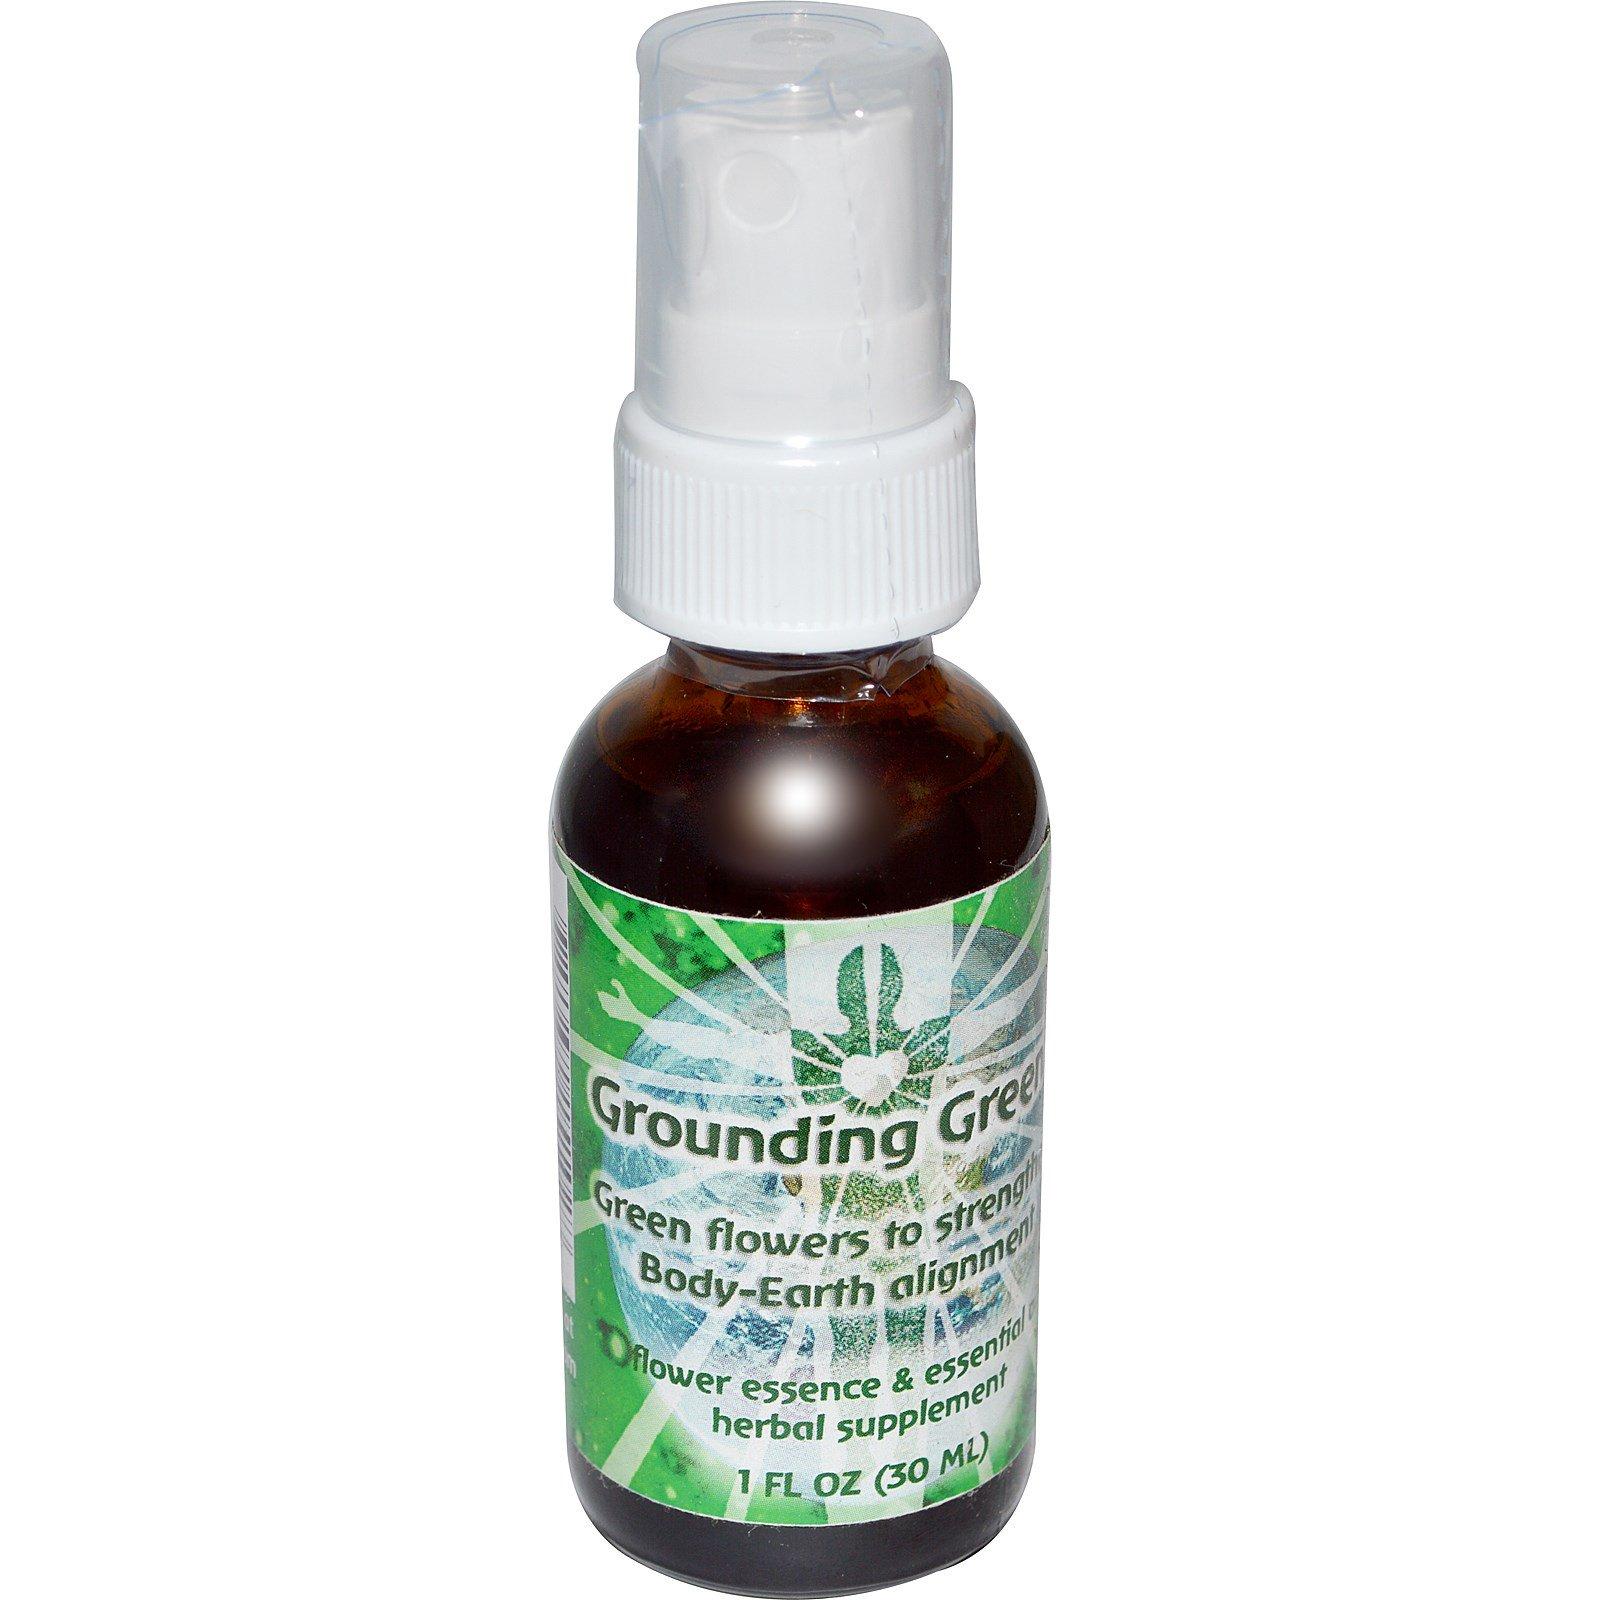 Flower Essence Services, Grounding Green, Flower Essence & Essential Oil, 1  fl oz (30 ml) (Discontinued Item)